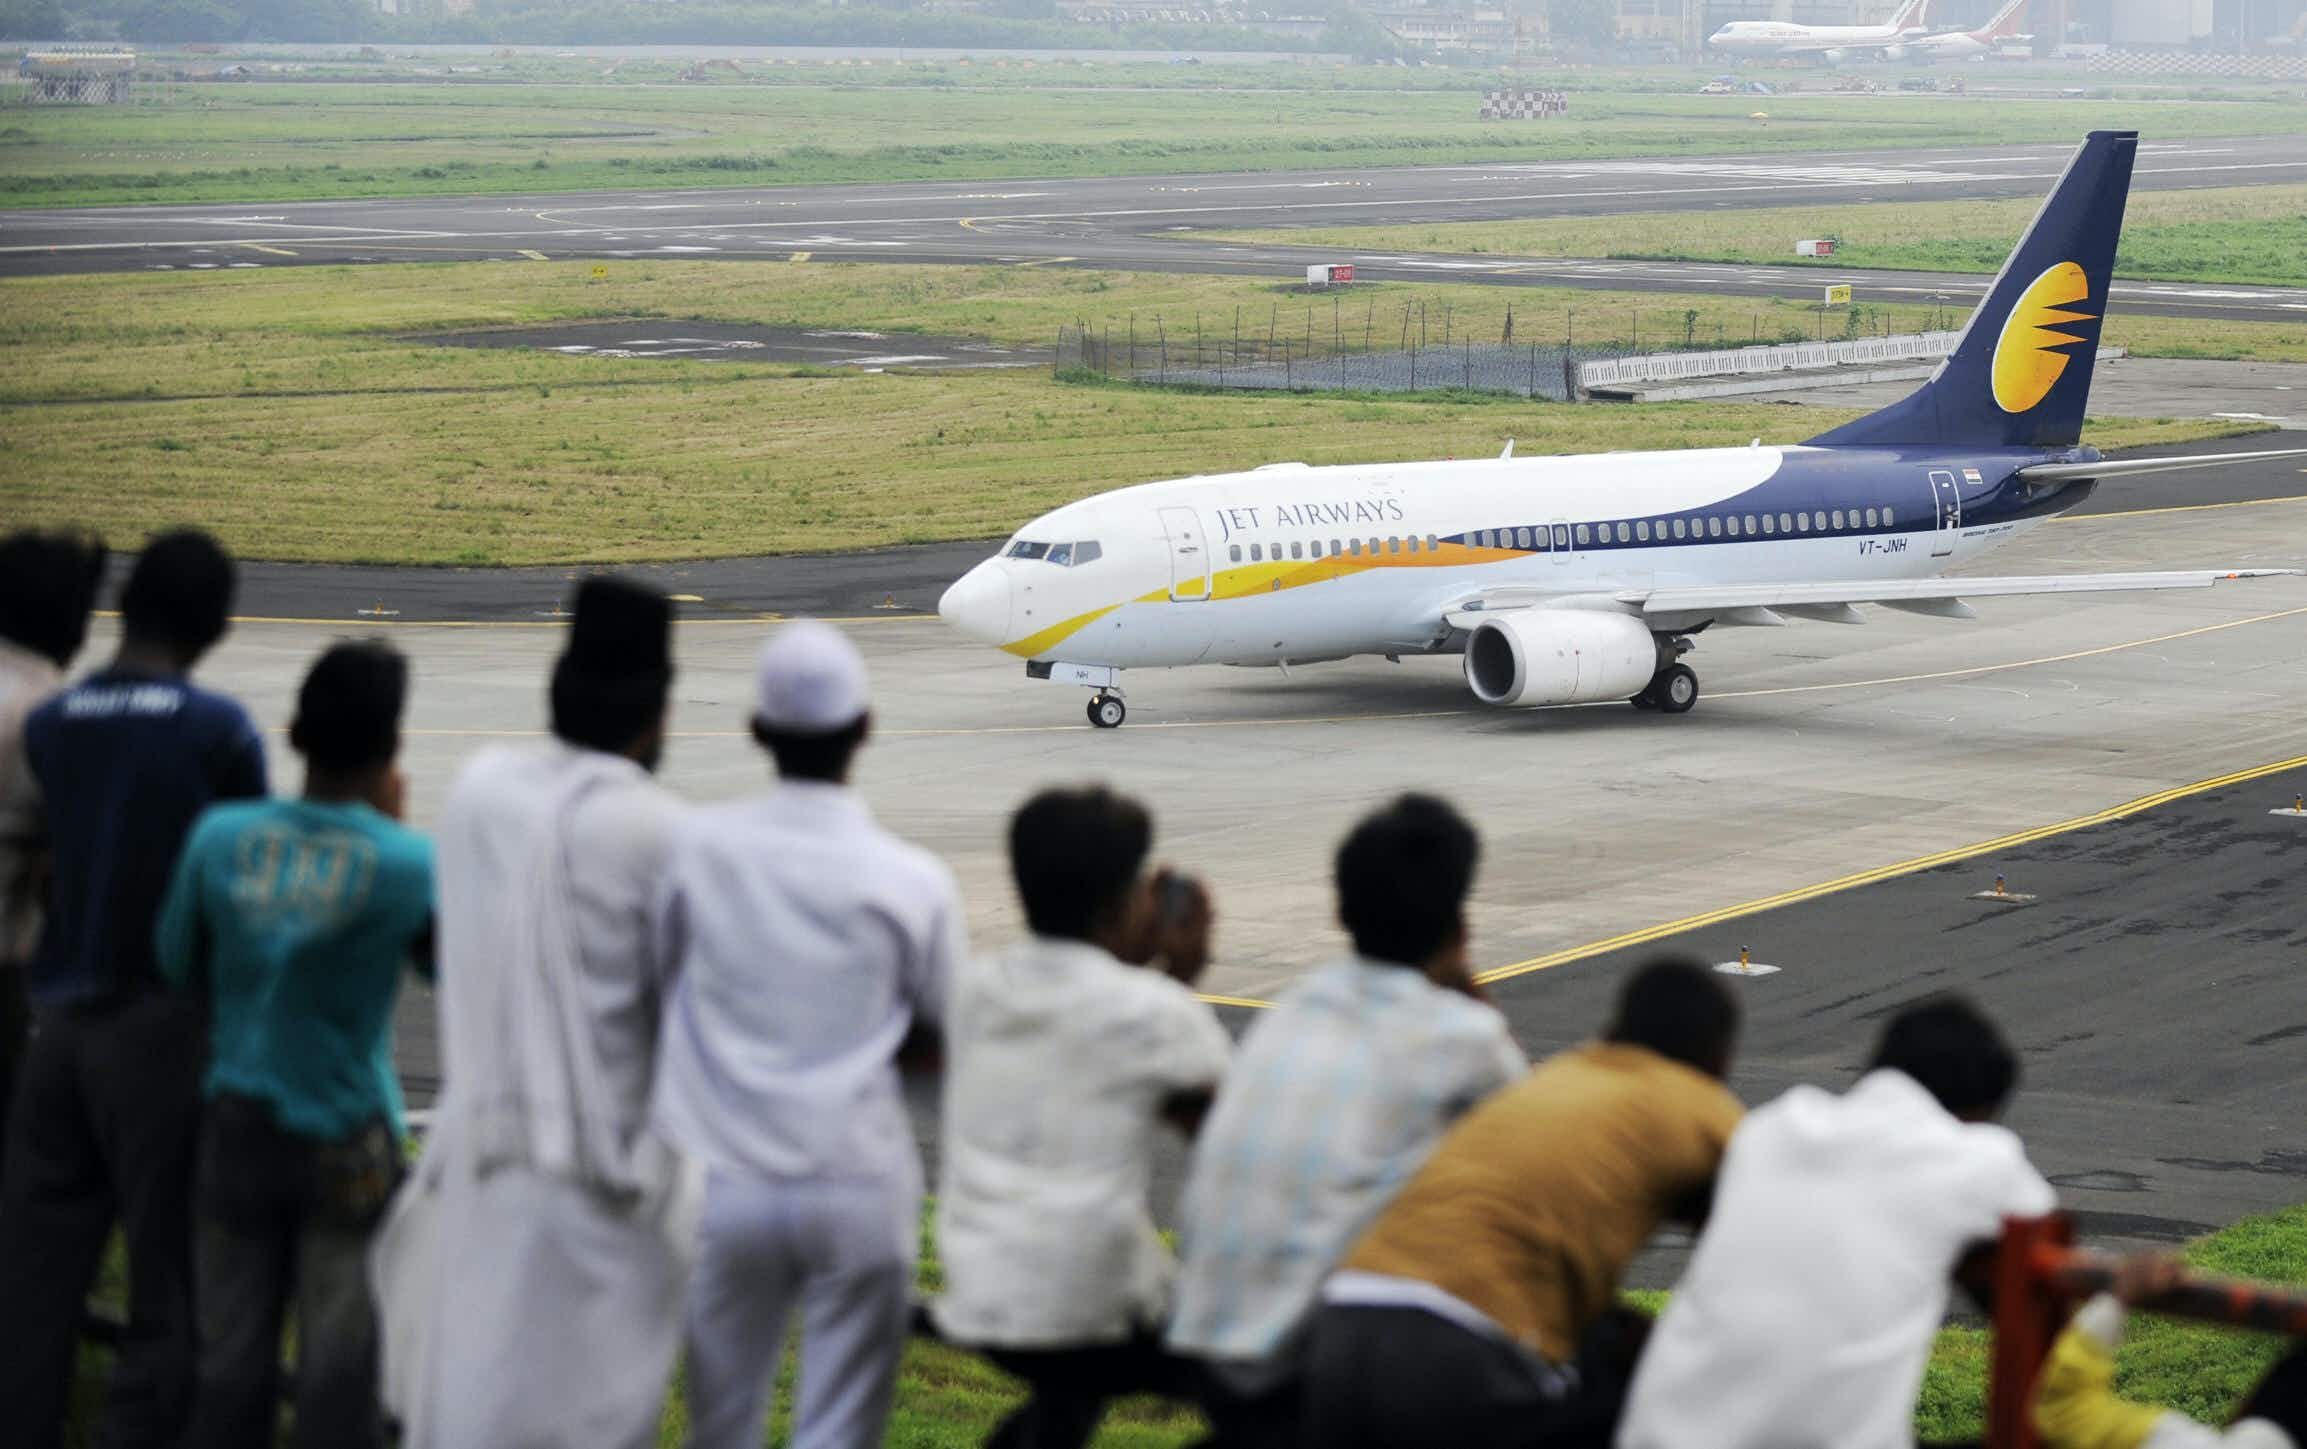 Baby born midair between India and Saudi Arabia gets free flights for life